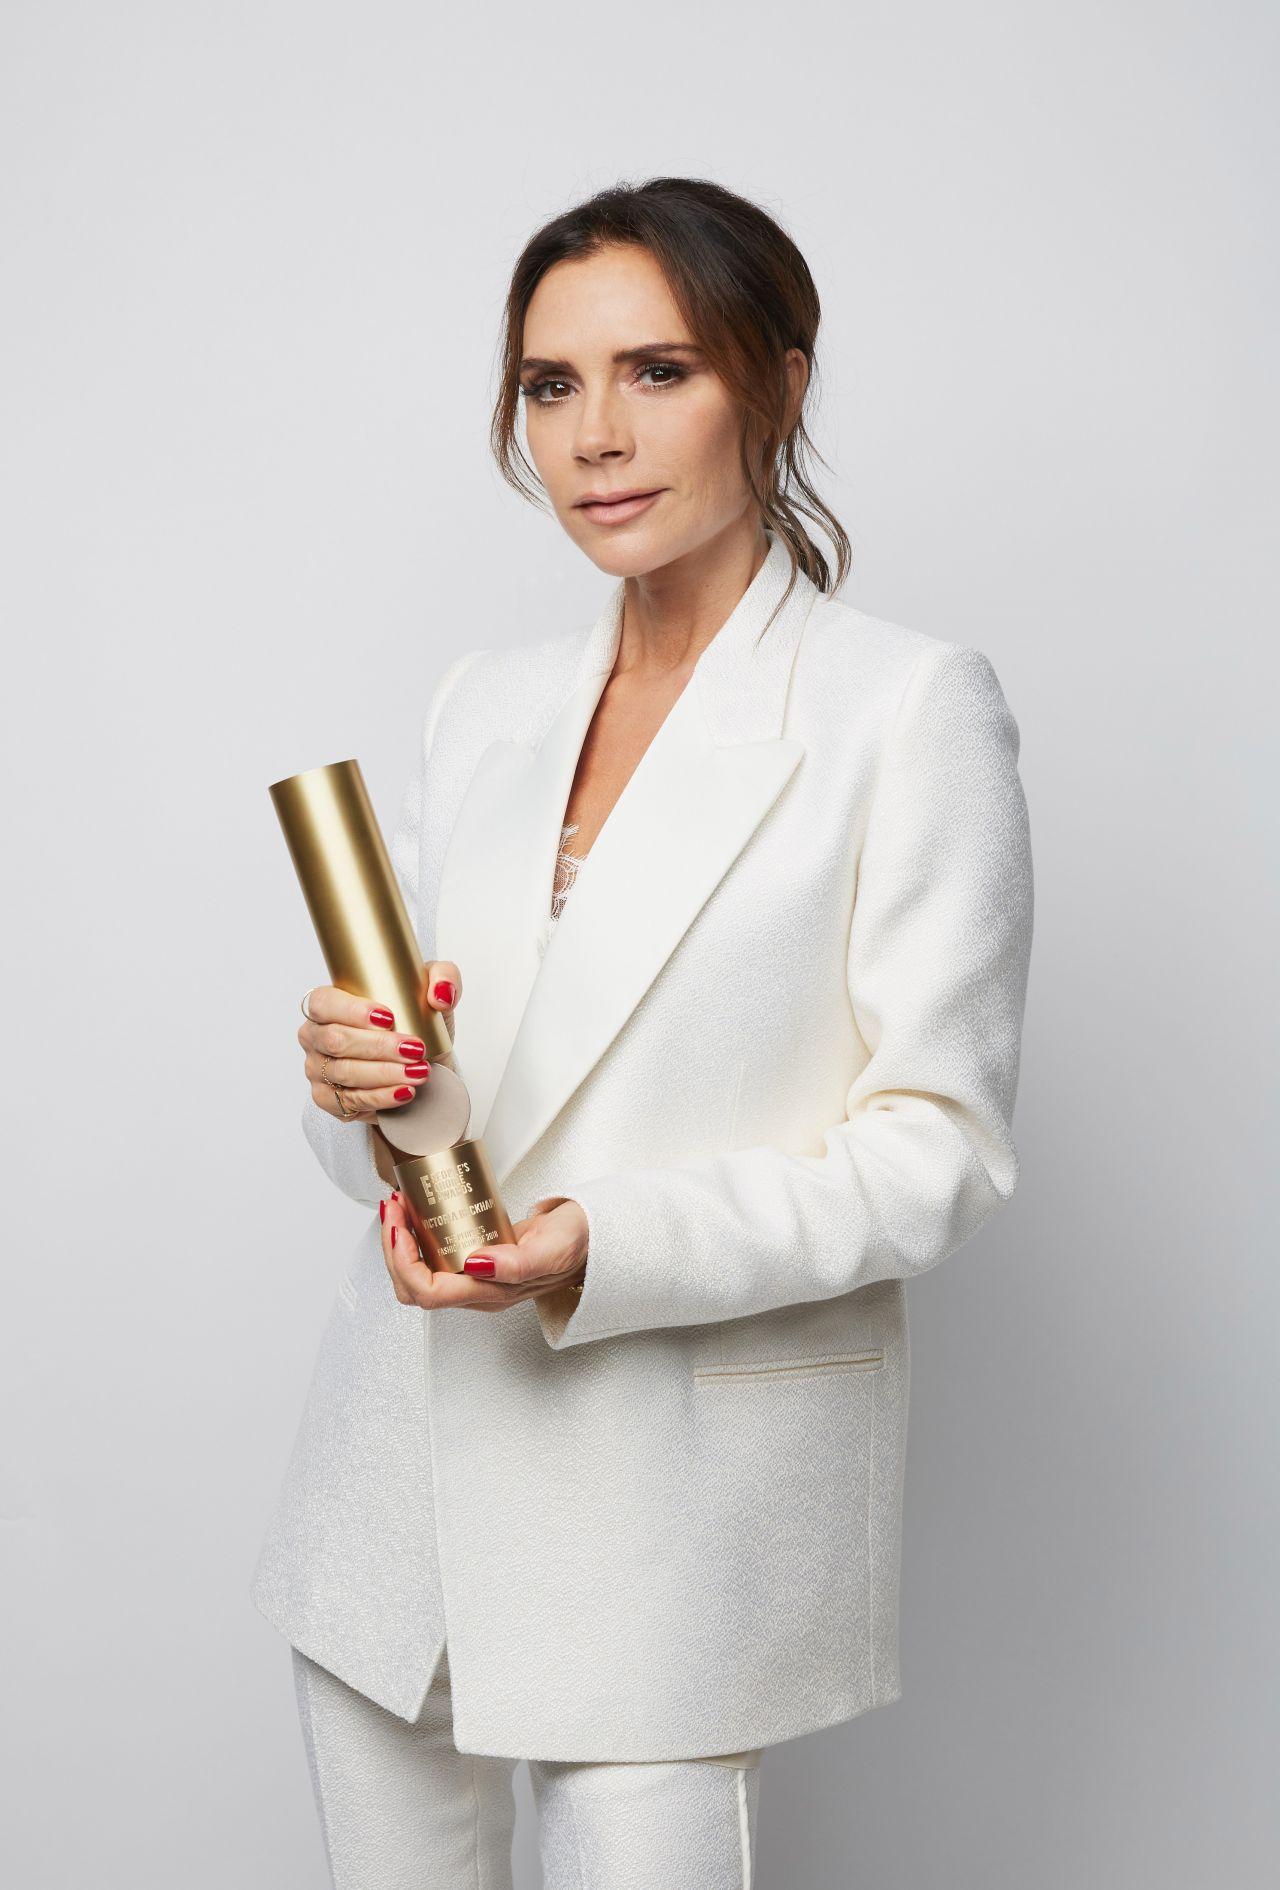 Victoria Beckham 2018 People S Choice Awards Portrait